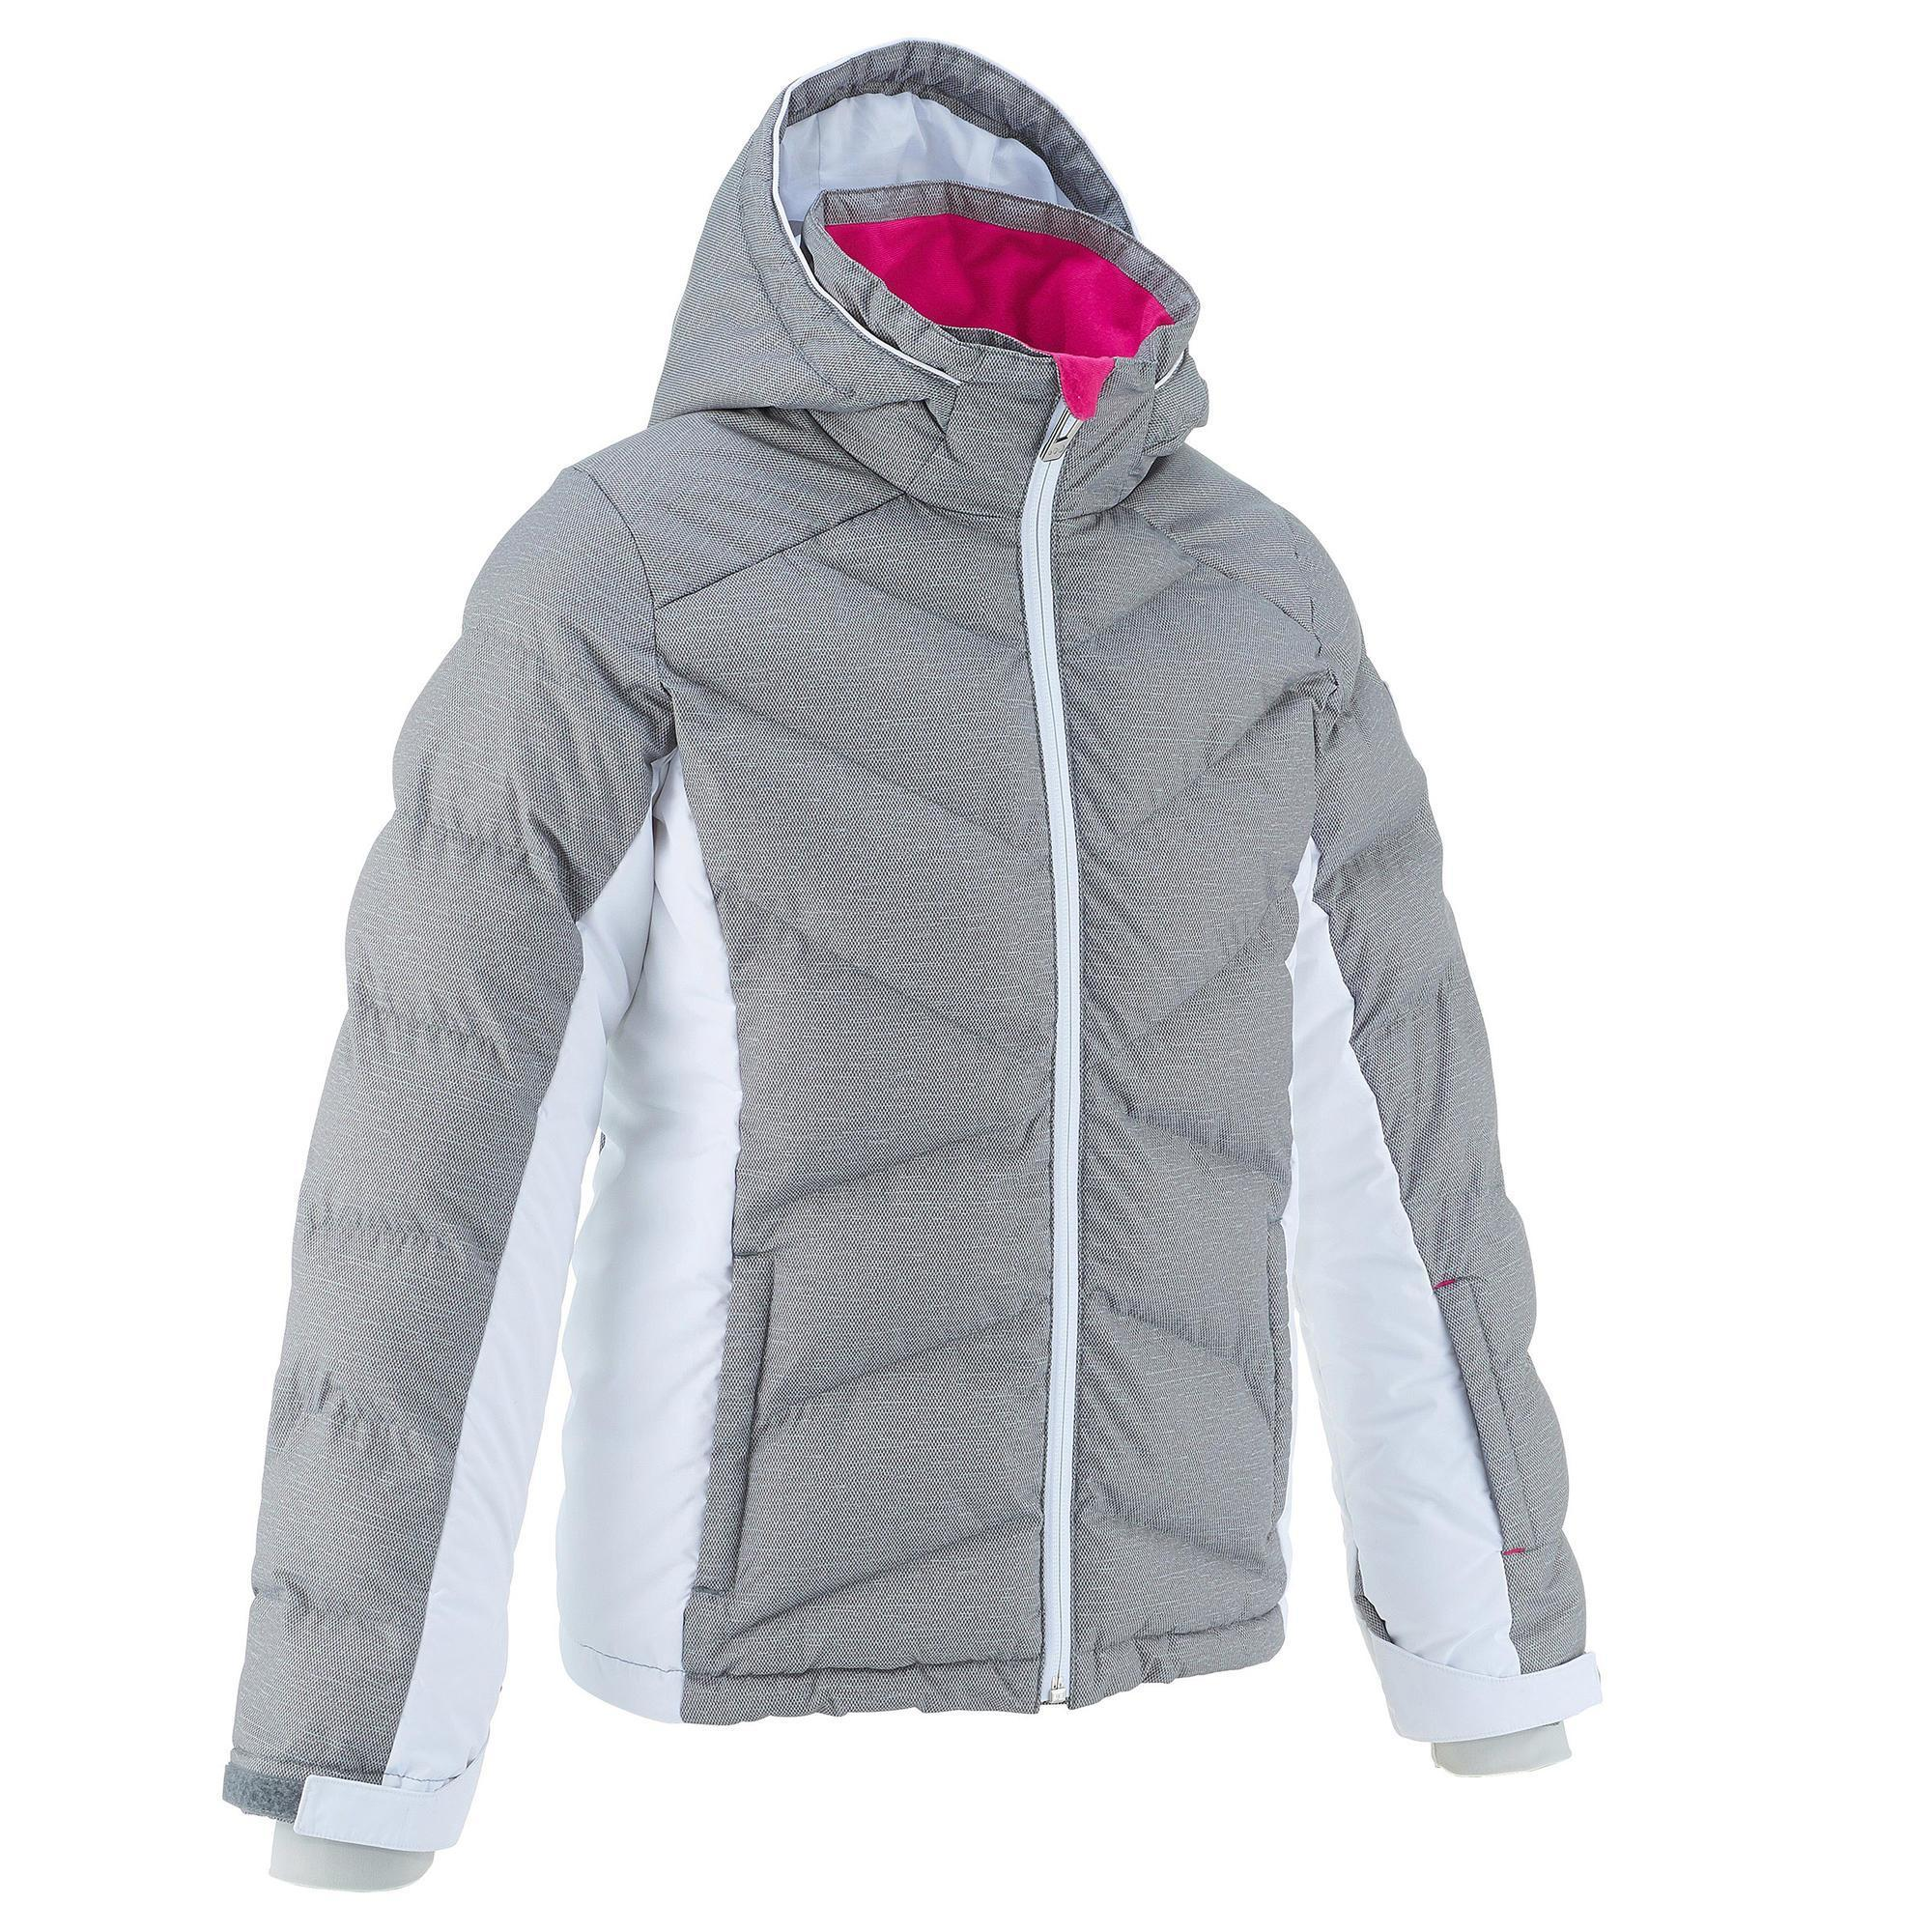 doudoune de ski enfant ski p jkt 500 warm grise et blanche wedze. Black Bedroom Furniture Sets. Home Design Ideas